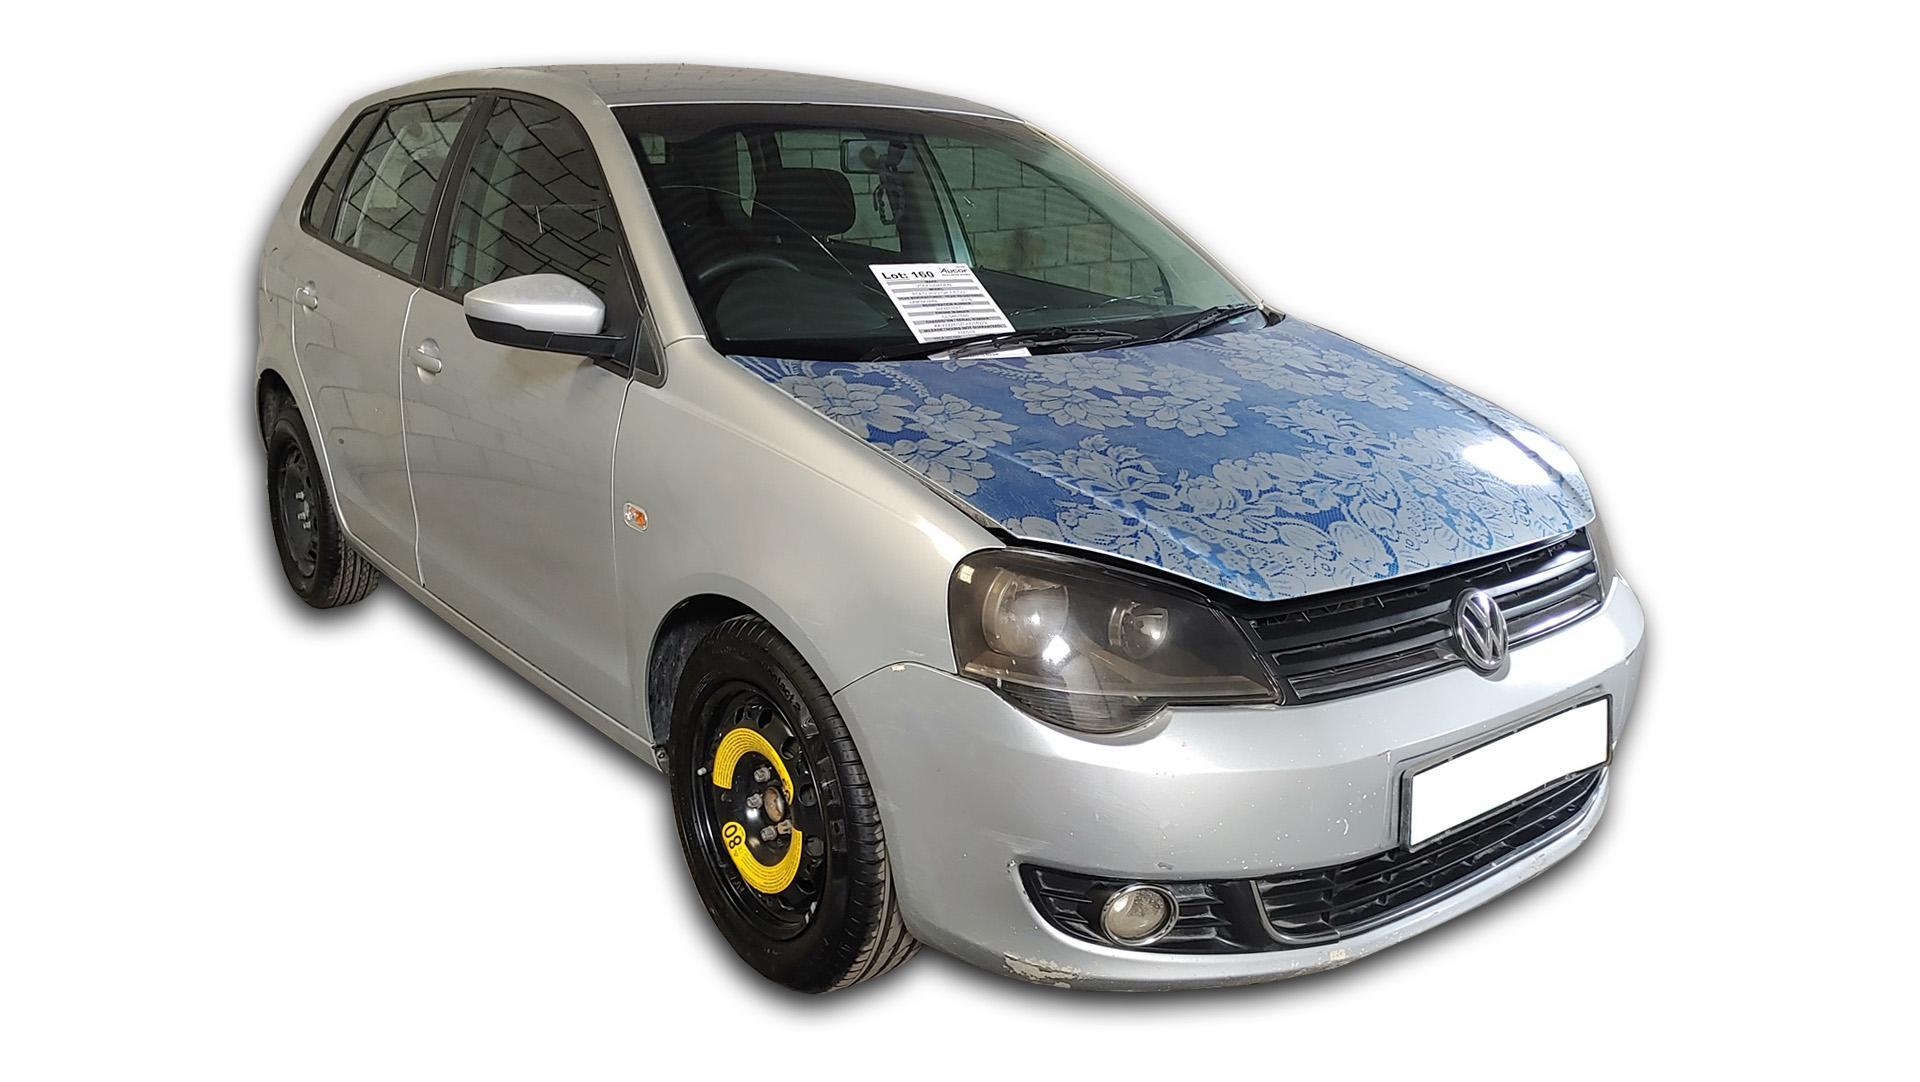 Volkswagen Polo Vivo GP 1.6 CO